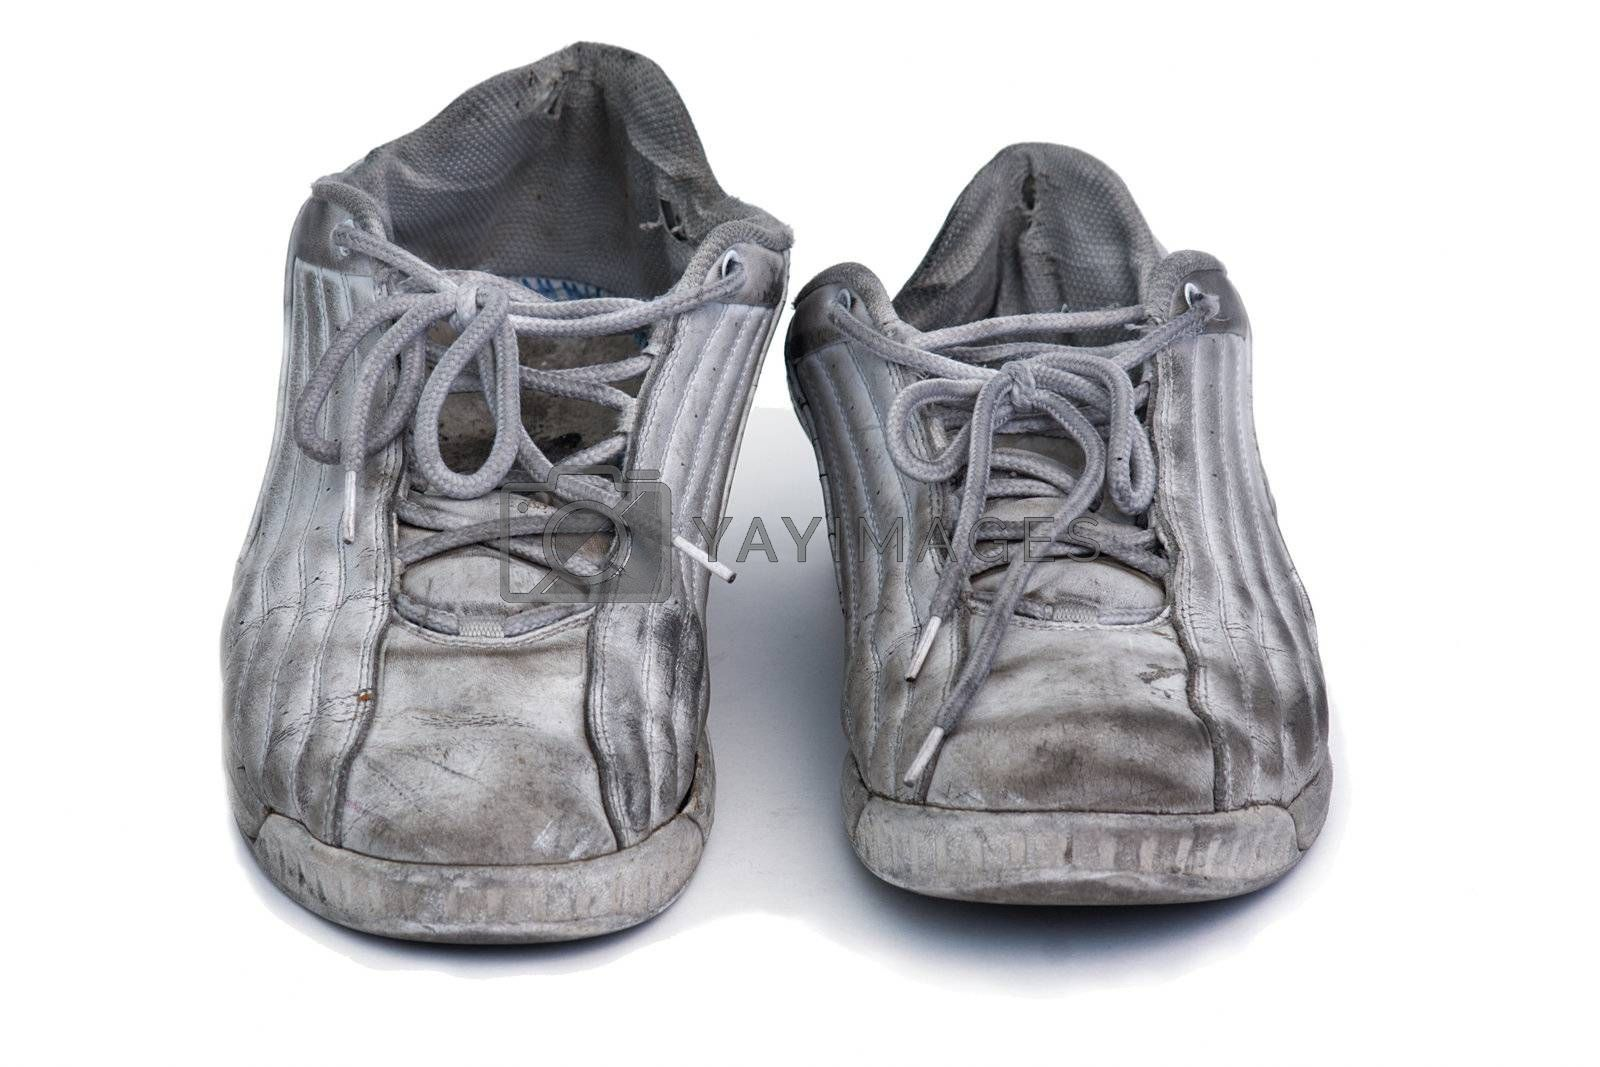 Royalty free image of worn sneakers by GunterNezhoda